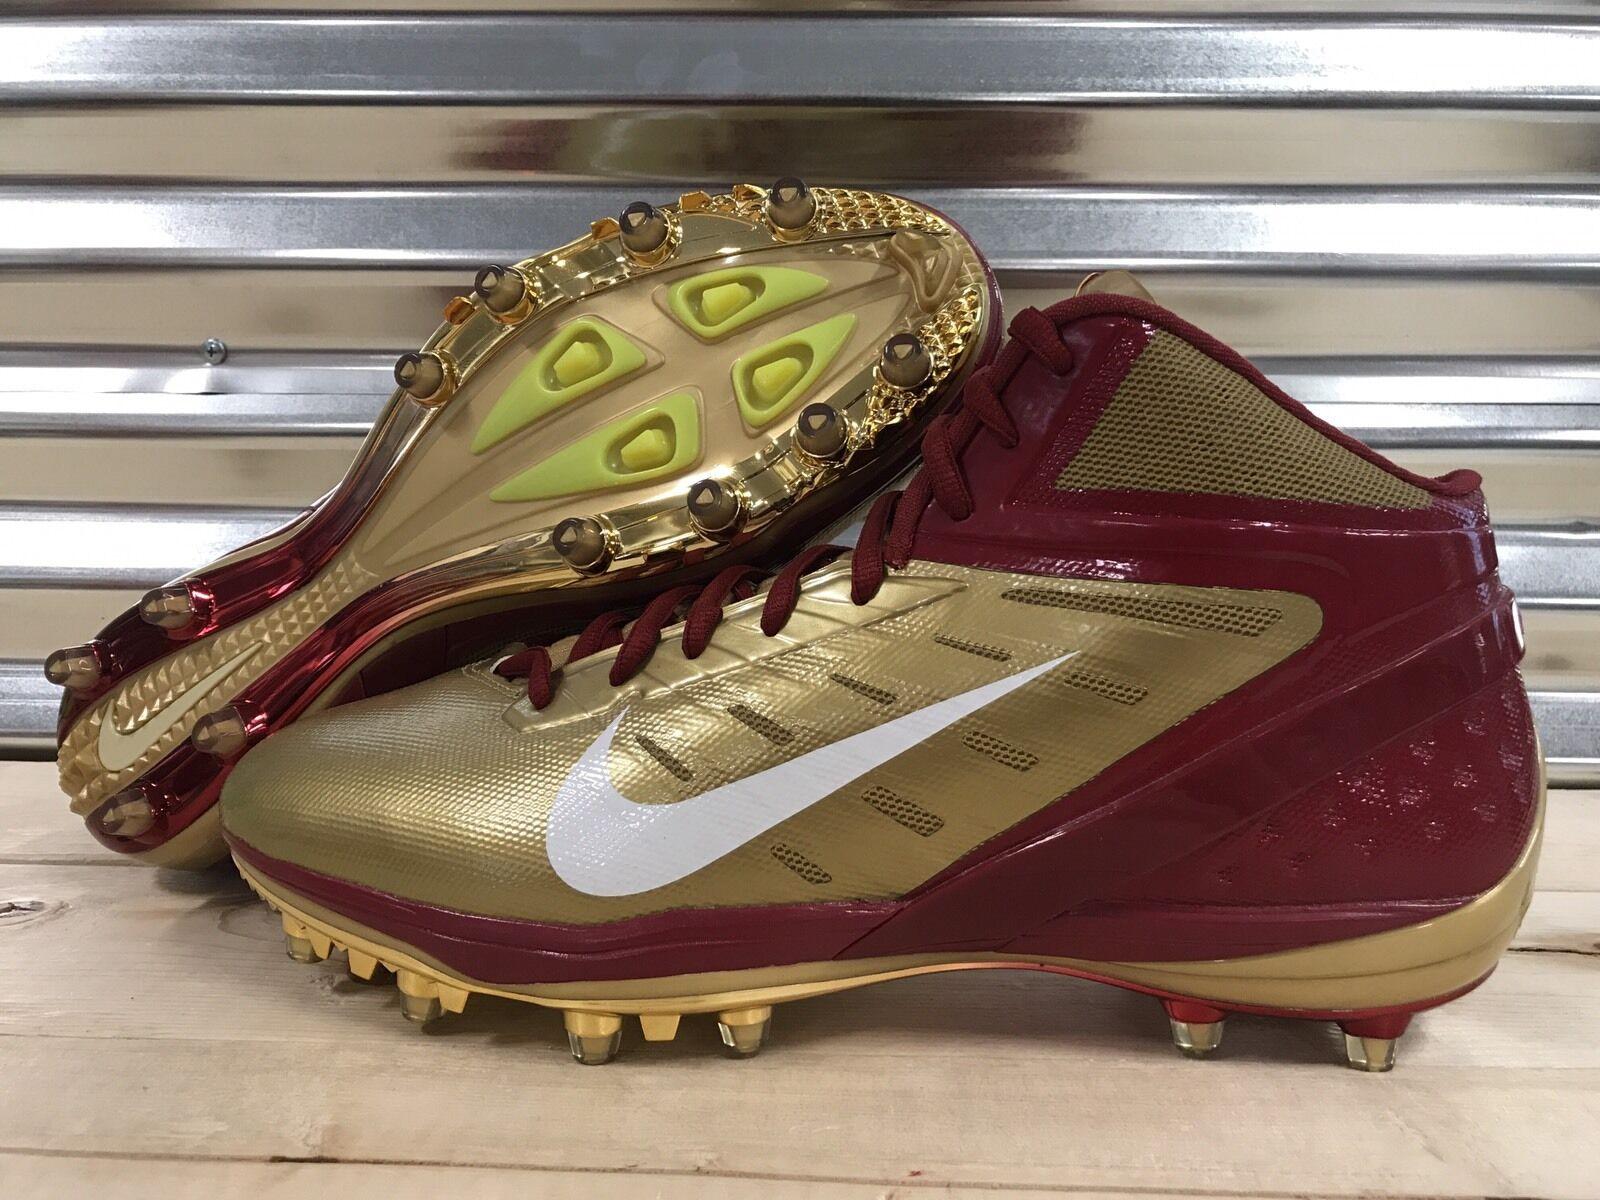 Nike Alpha Talon Elite Florida State Seminoles Football Cleats FSU Sample SZ 14